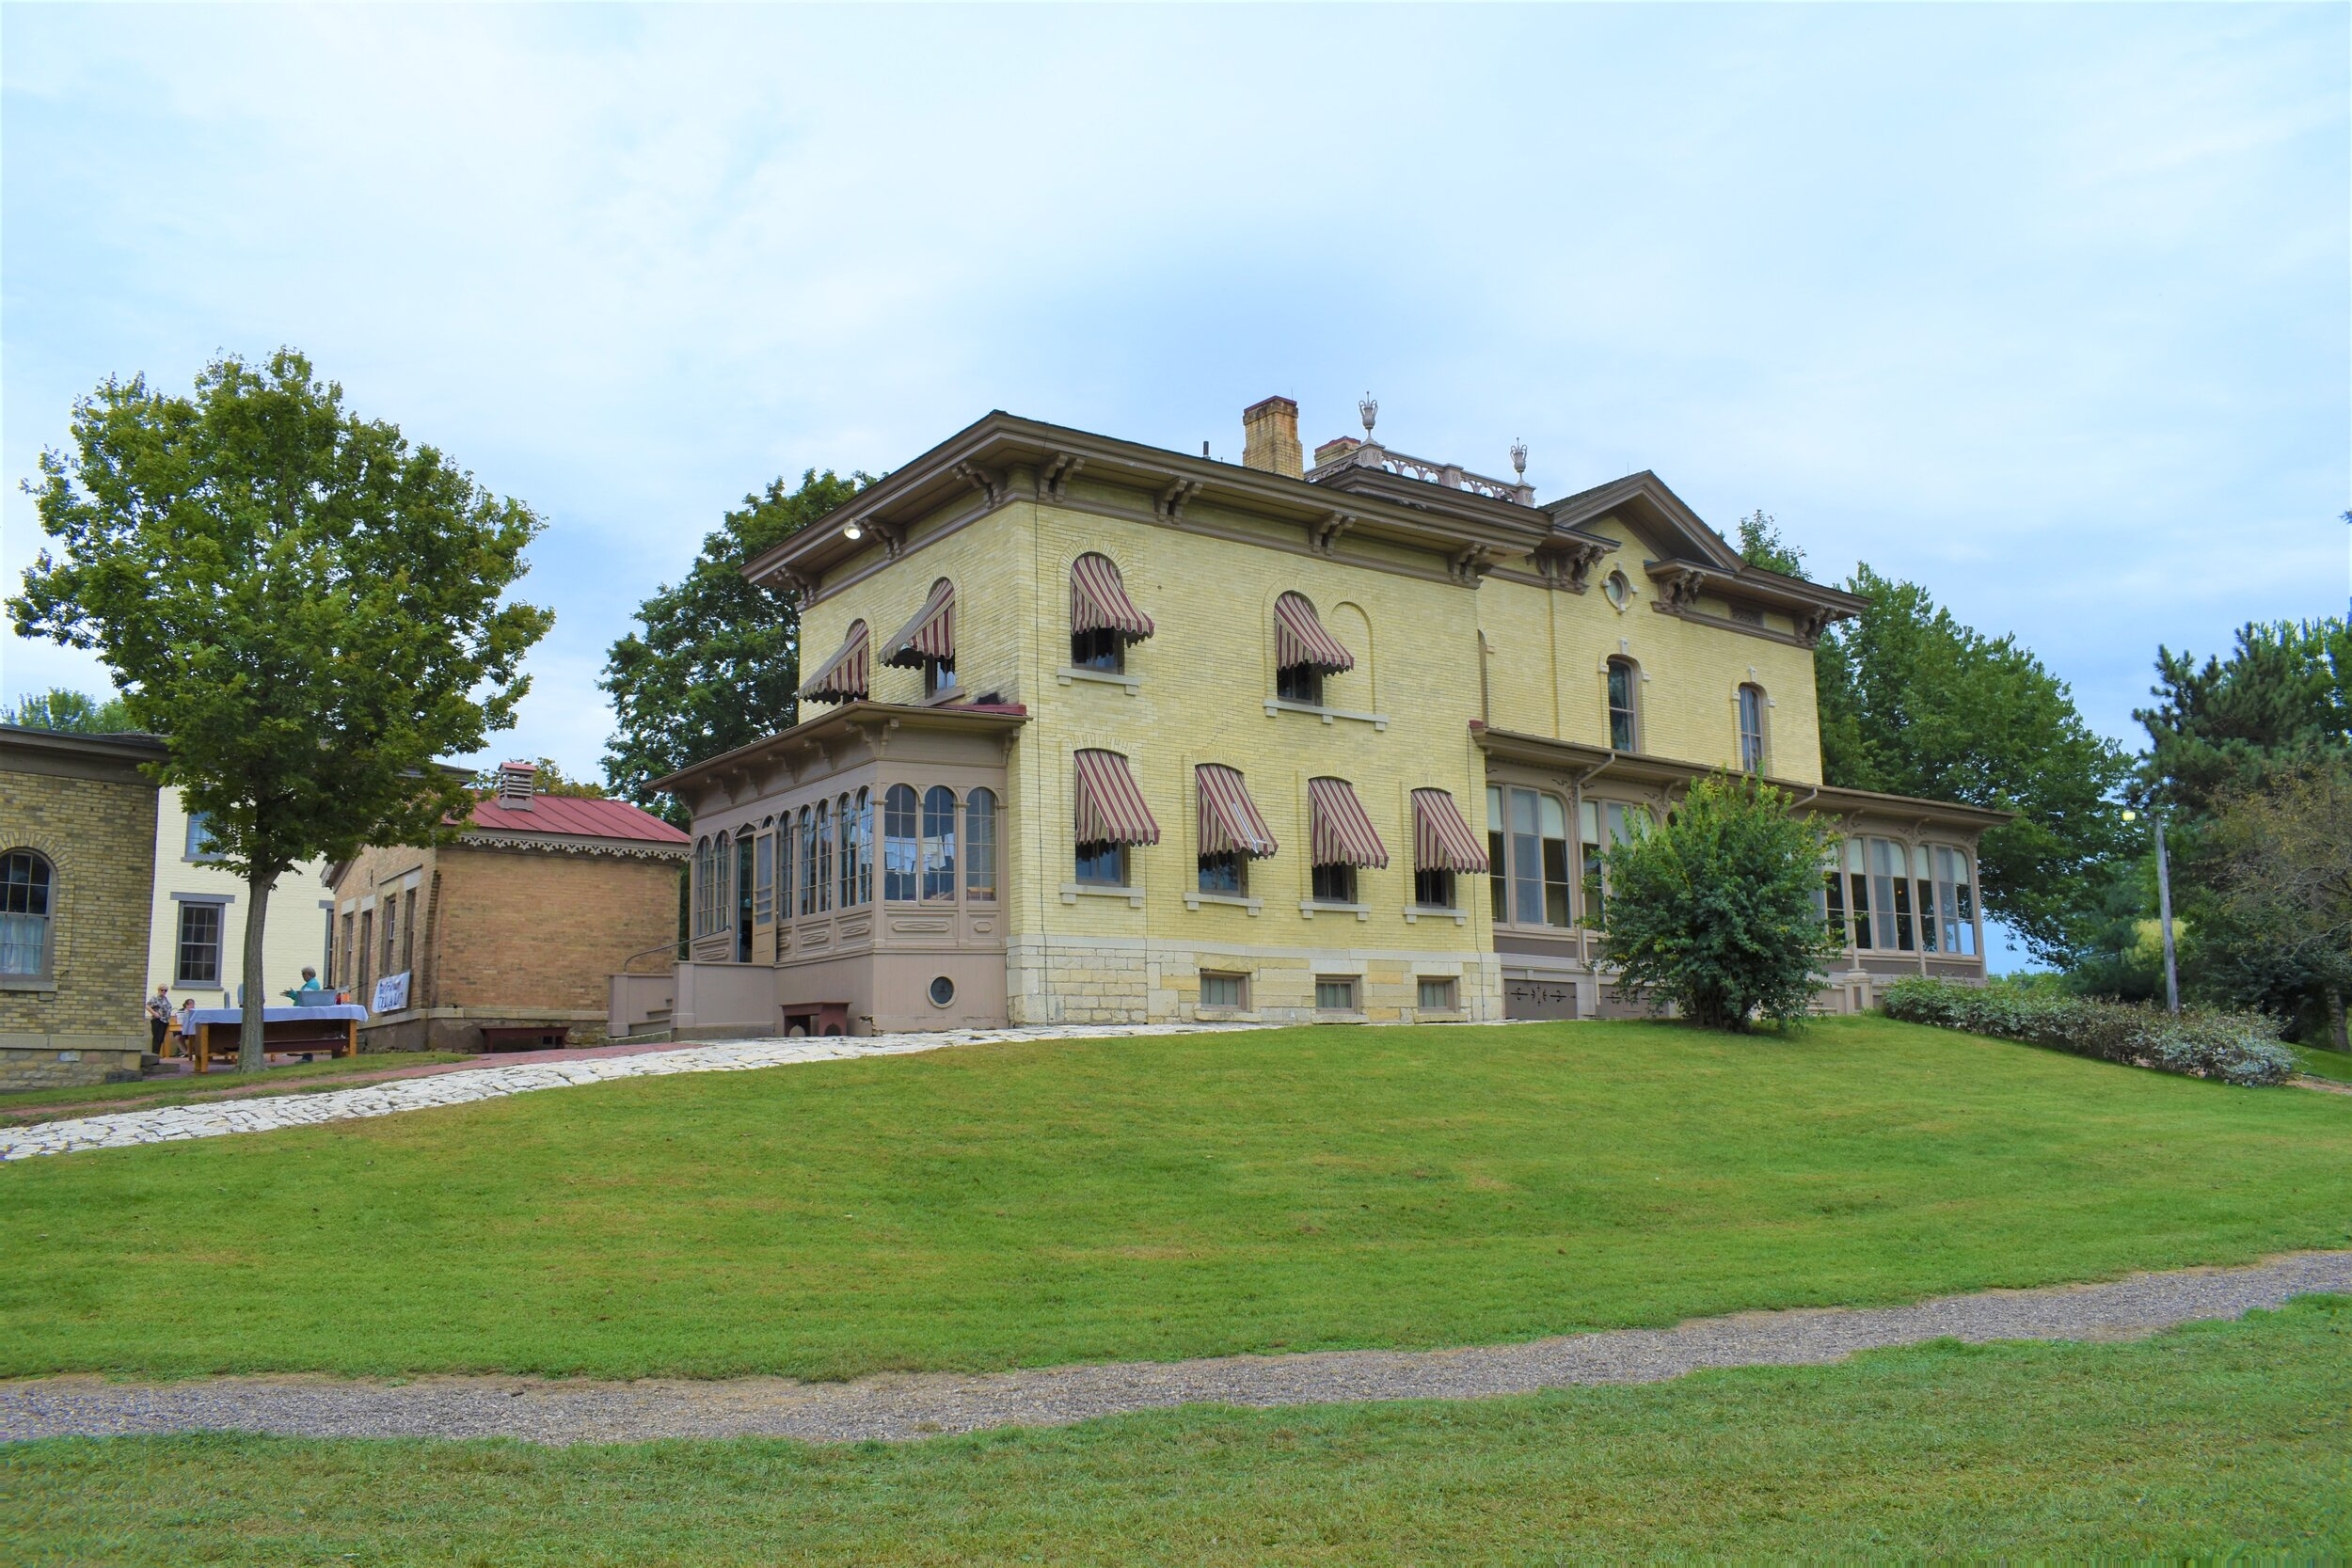 The Villa Louis mansion